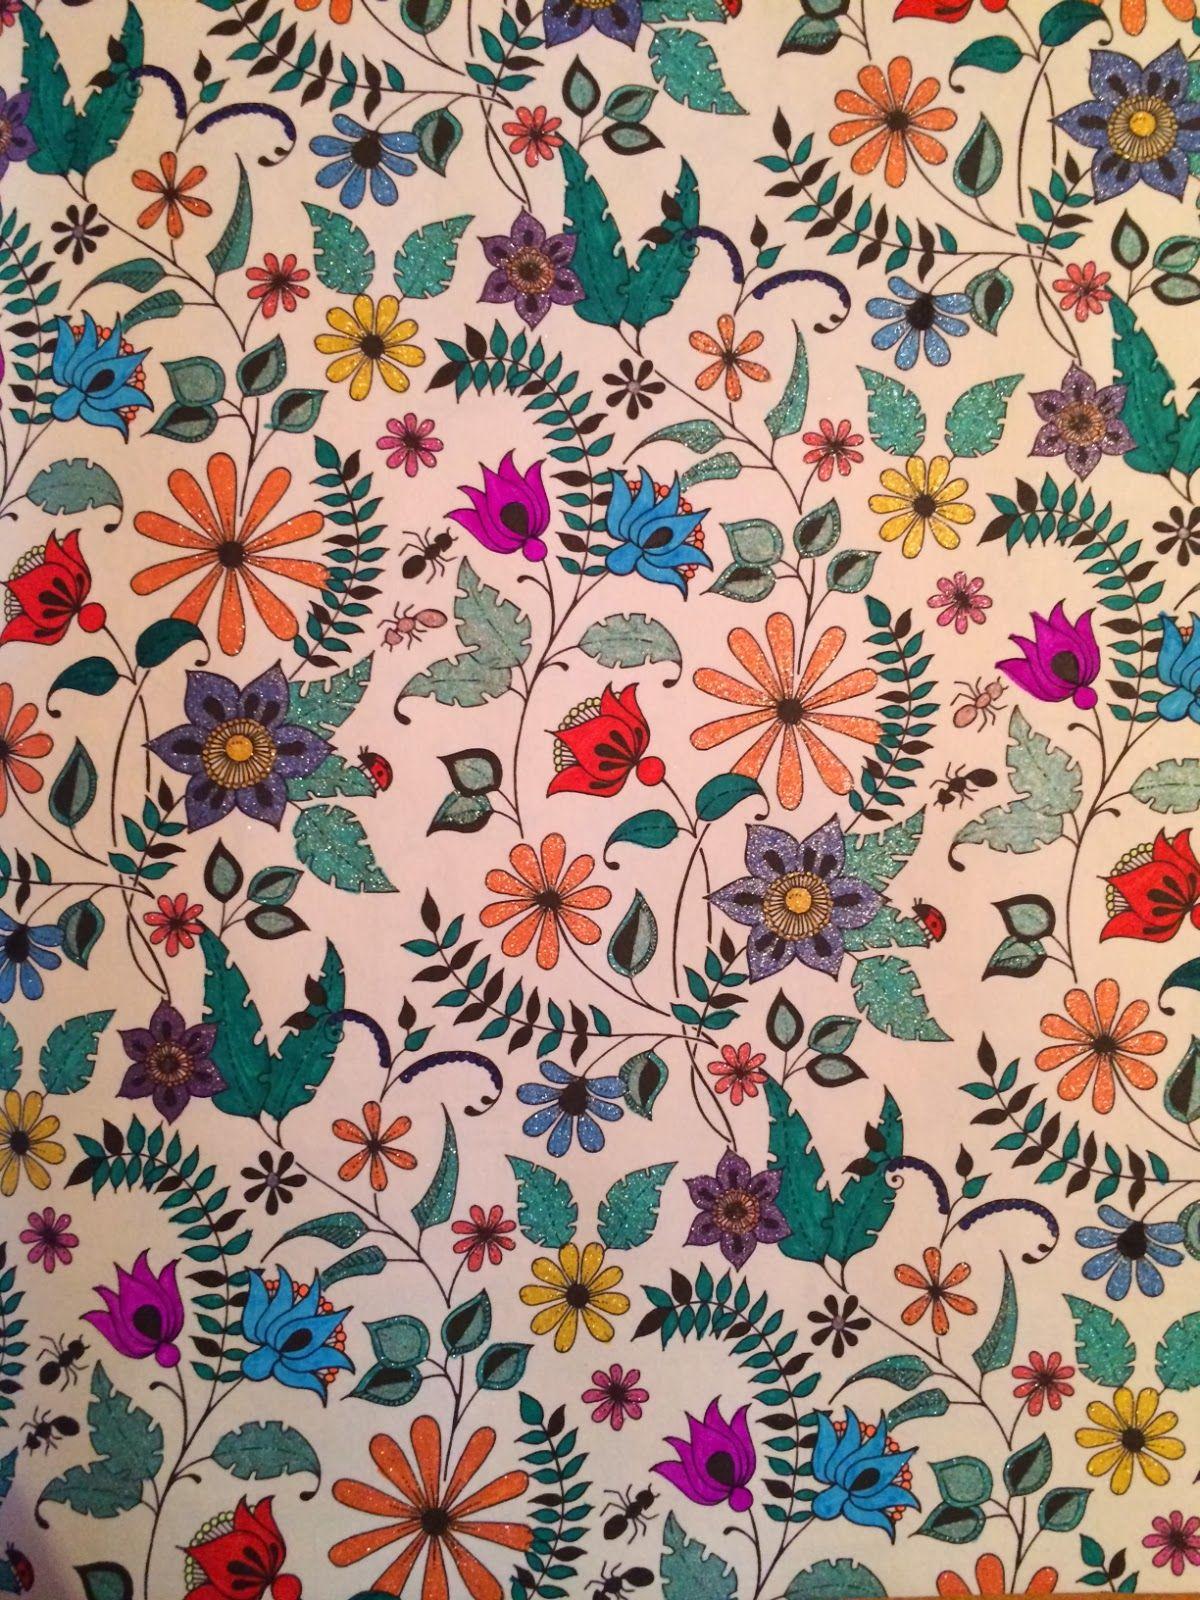 Best Secret Garden Colouring